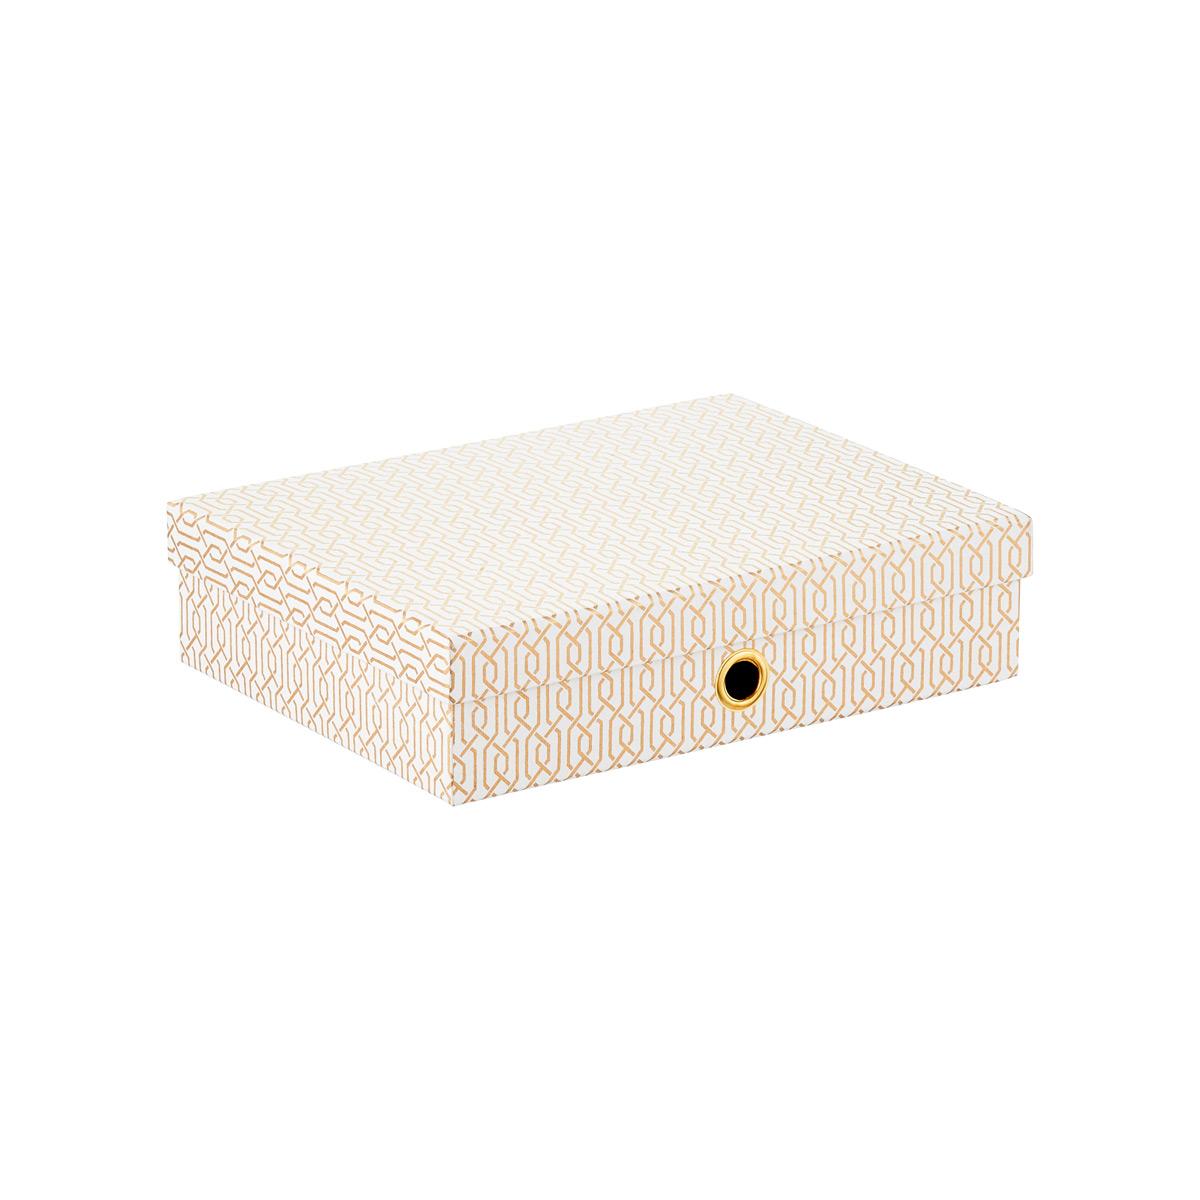 Gold U0026 White Ornate Office Storage Boxes